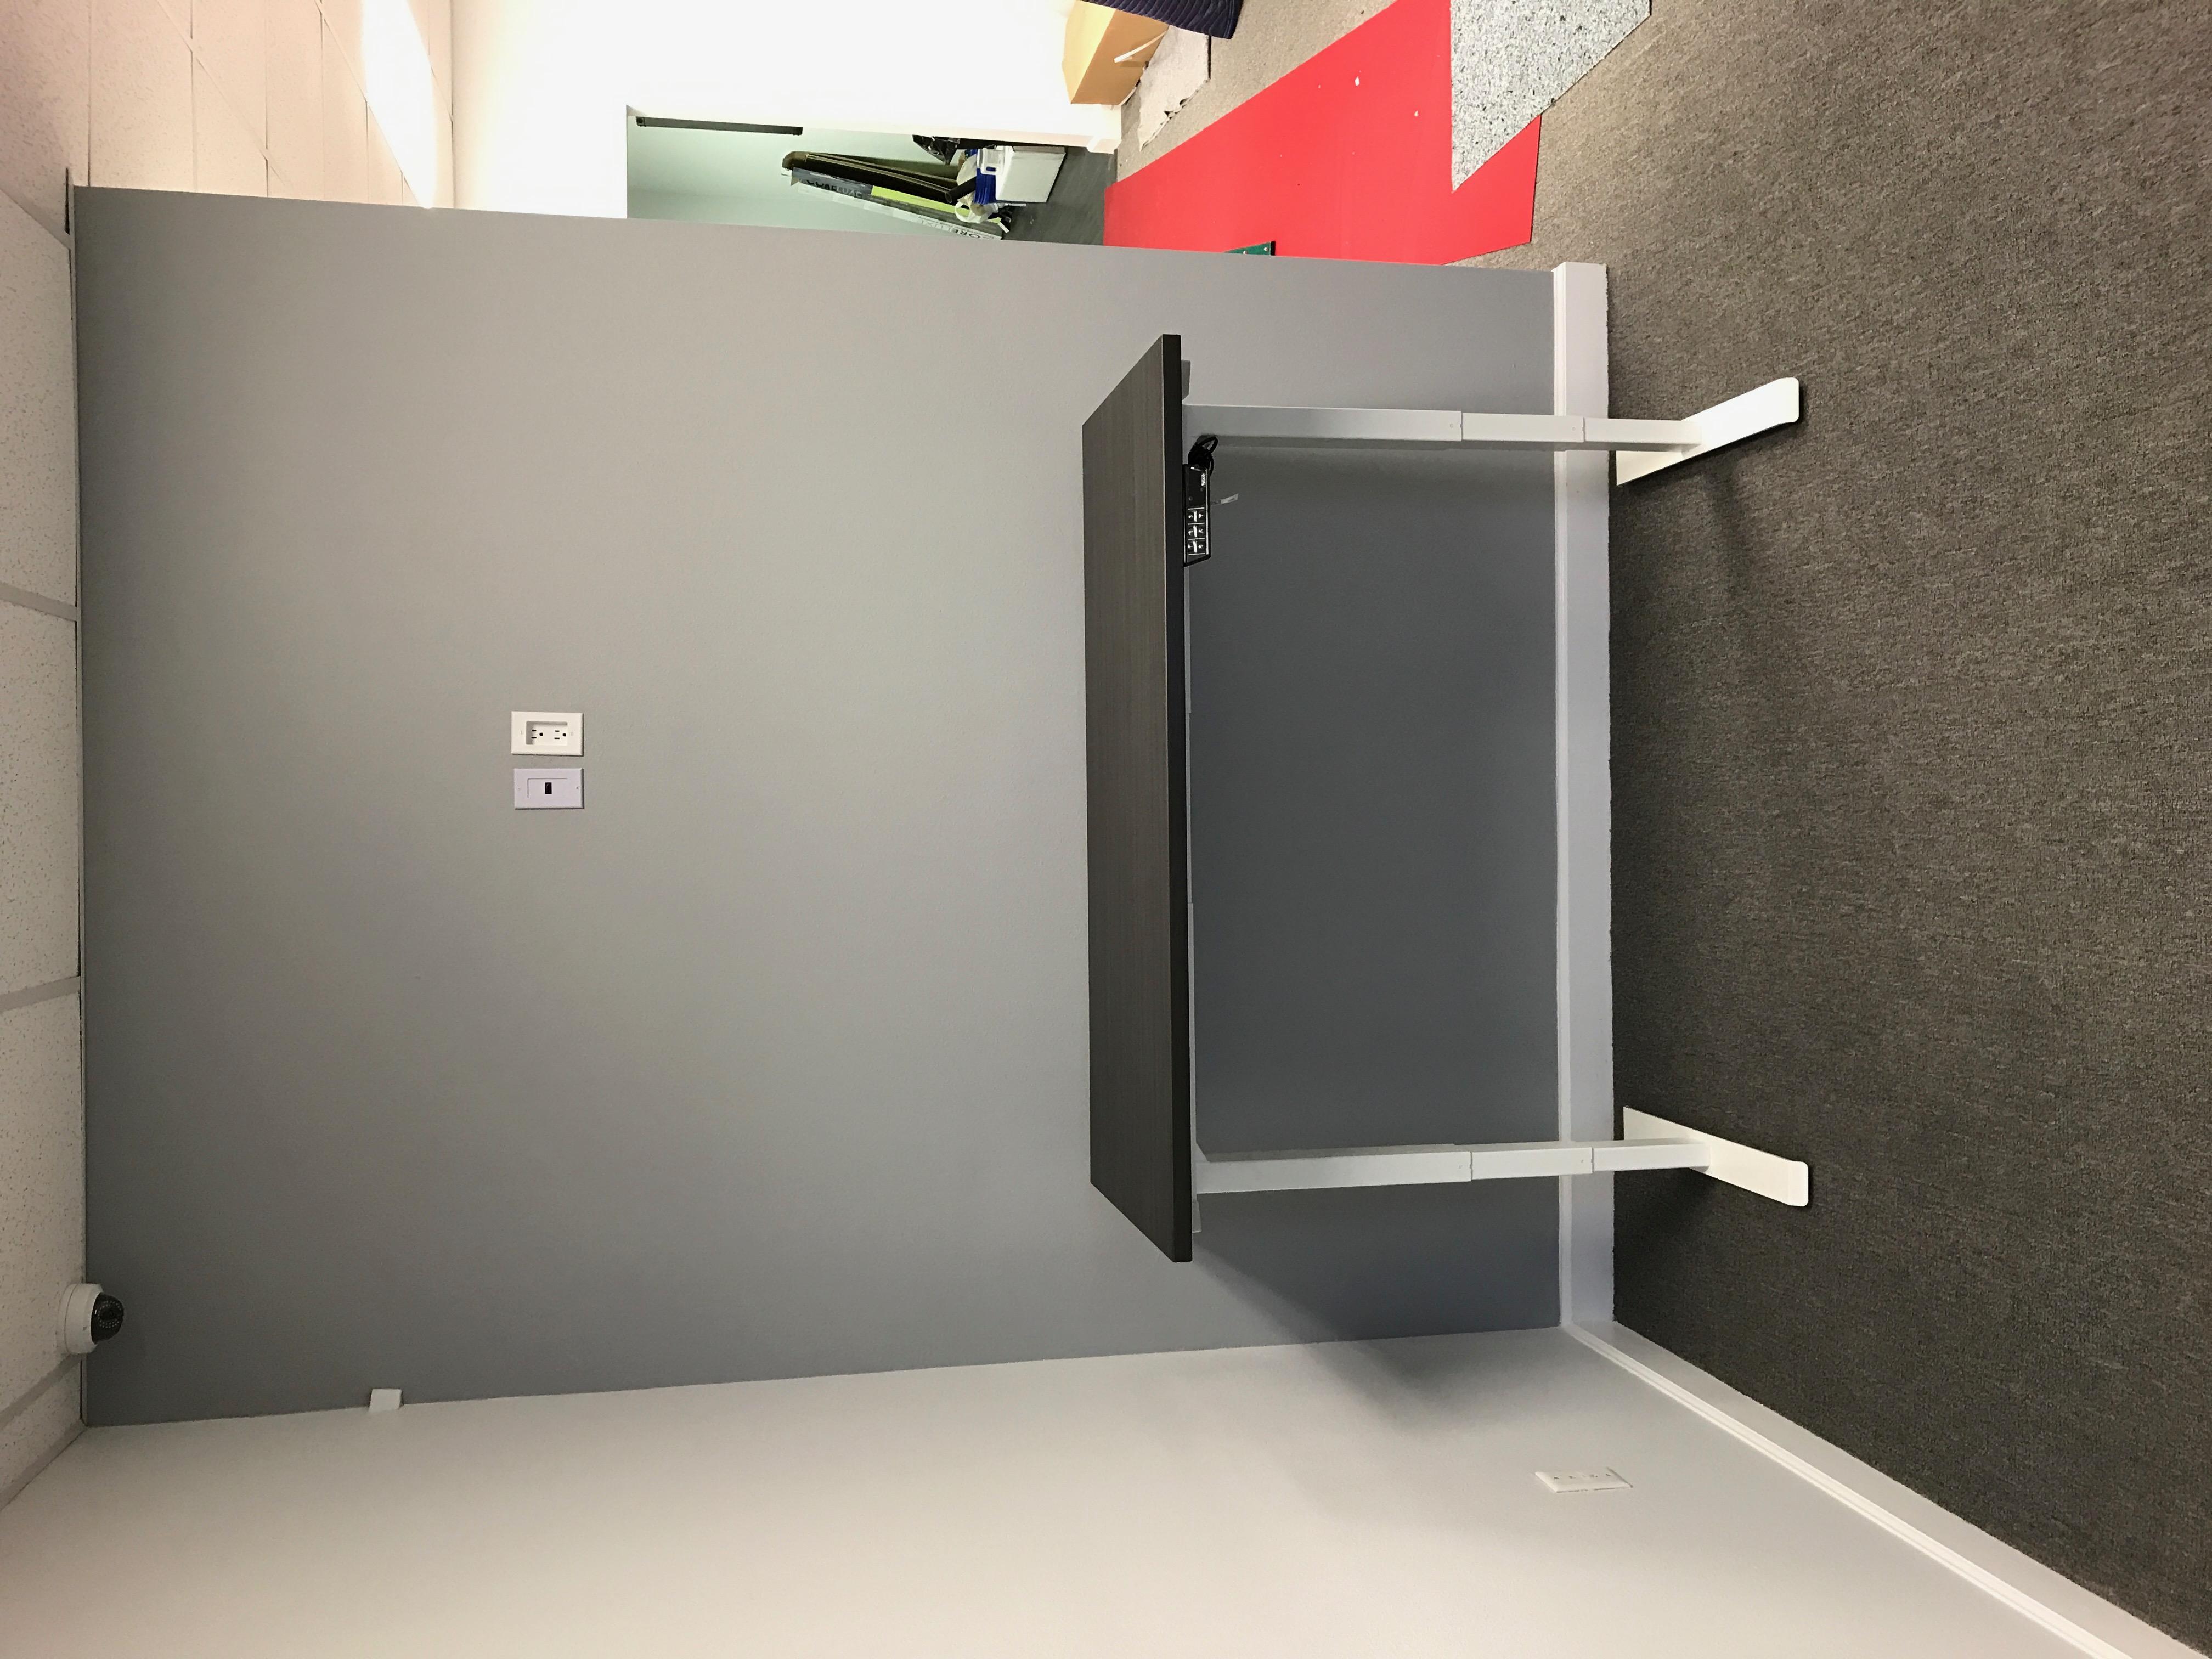 manasota-office-supplies-llc-adjustable-tables-in-bradenton-florida-manasota-office-supplies-llc-13-.jpg